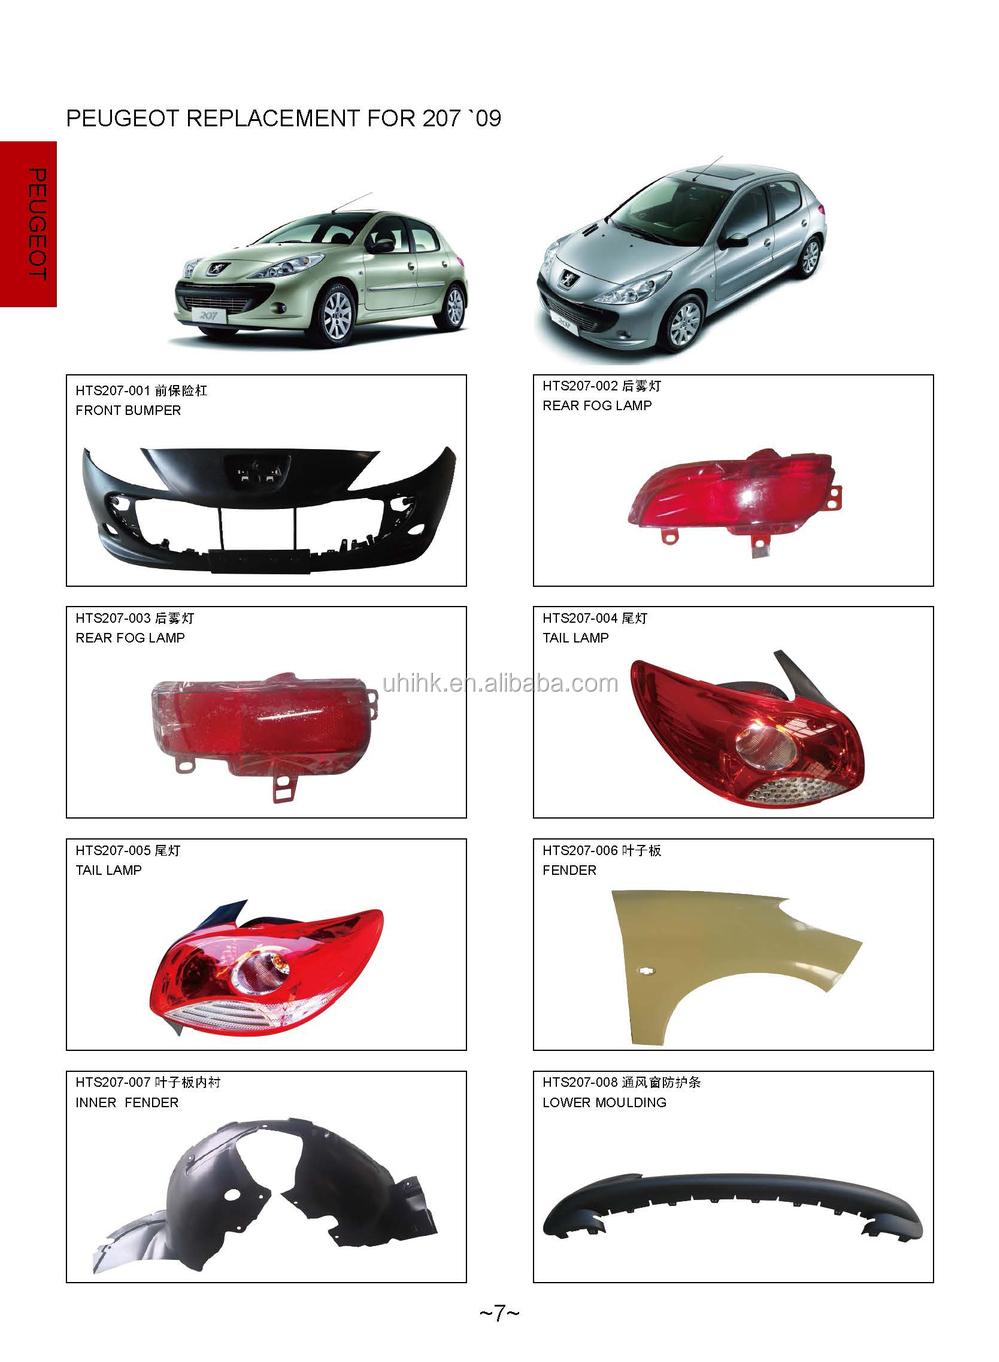 Car body parts front bumper rear fog lamp taillamp fender inner fender lower